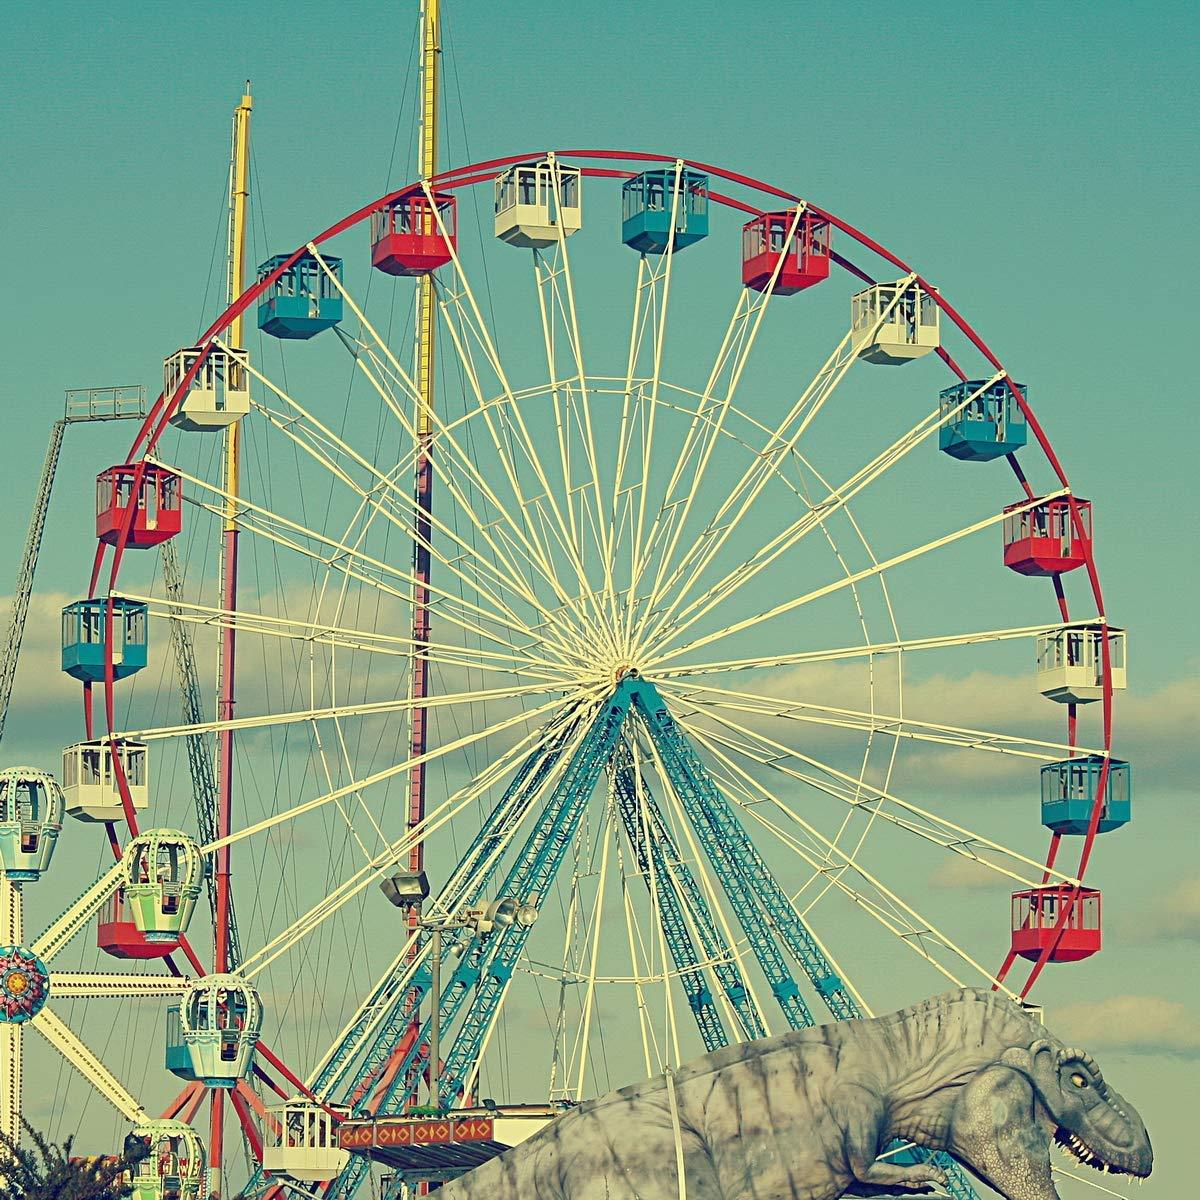 Amazon Com Vintage Style Photograph Of The Ferris Wheel T Rex At The Funtown Pier On The Seaside Park Boardwalk Jersey Shore Ferris Wheel And Dinosaur 2 Nursery Wall Art Fence ferris wheel 4k hd photography